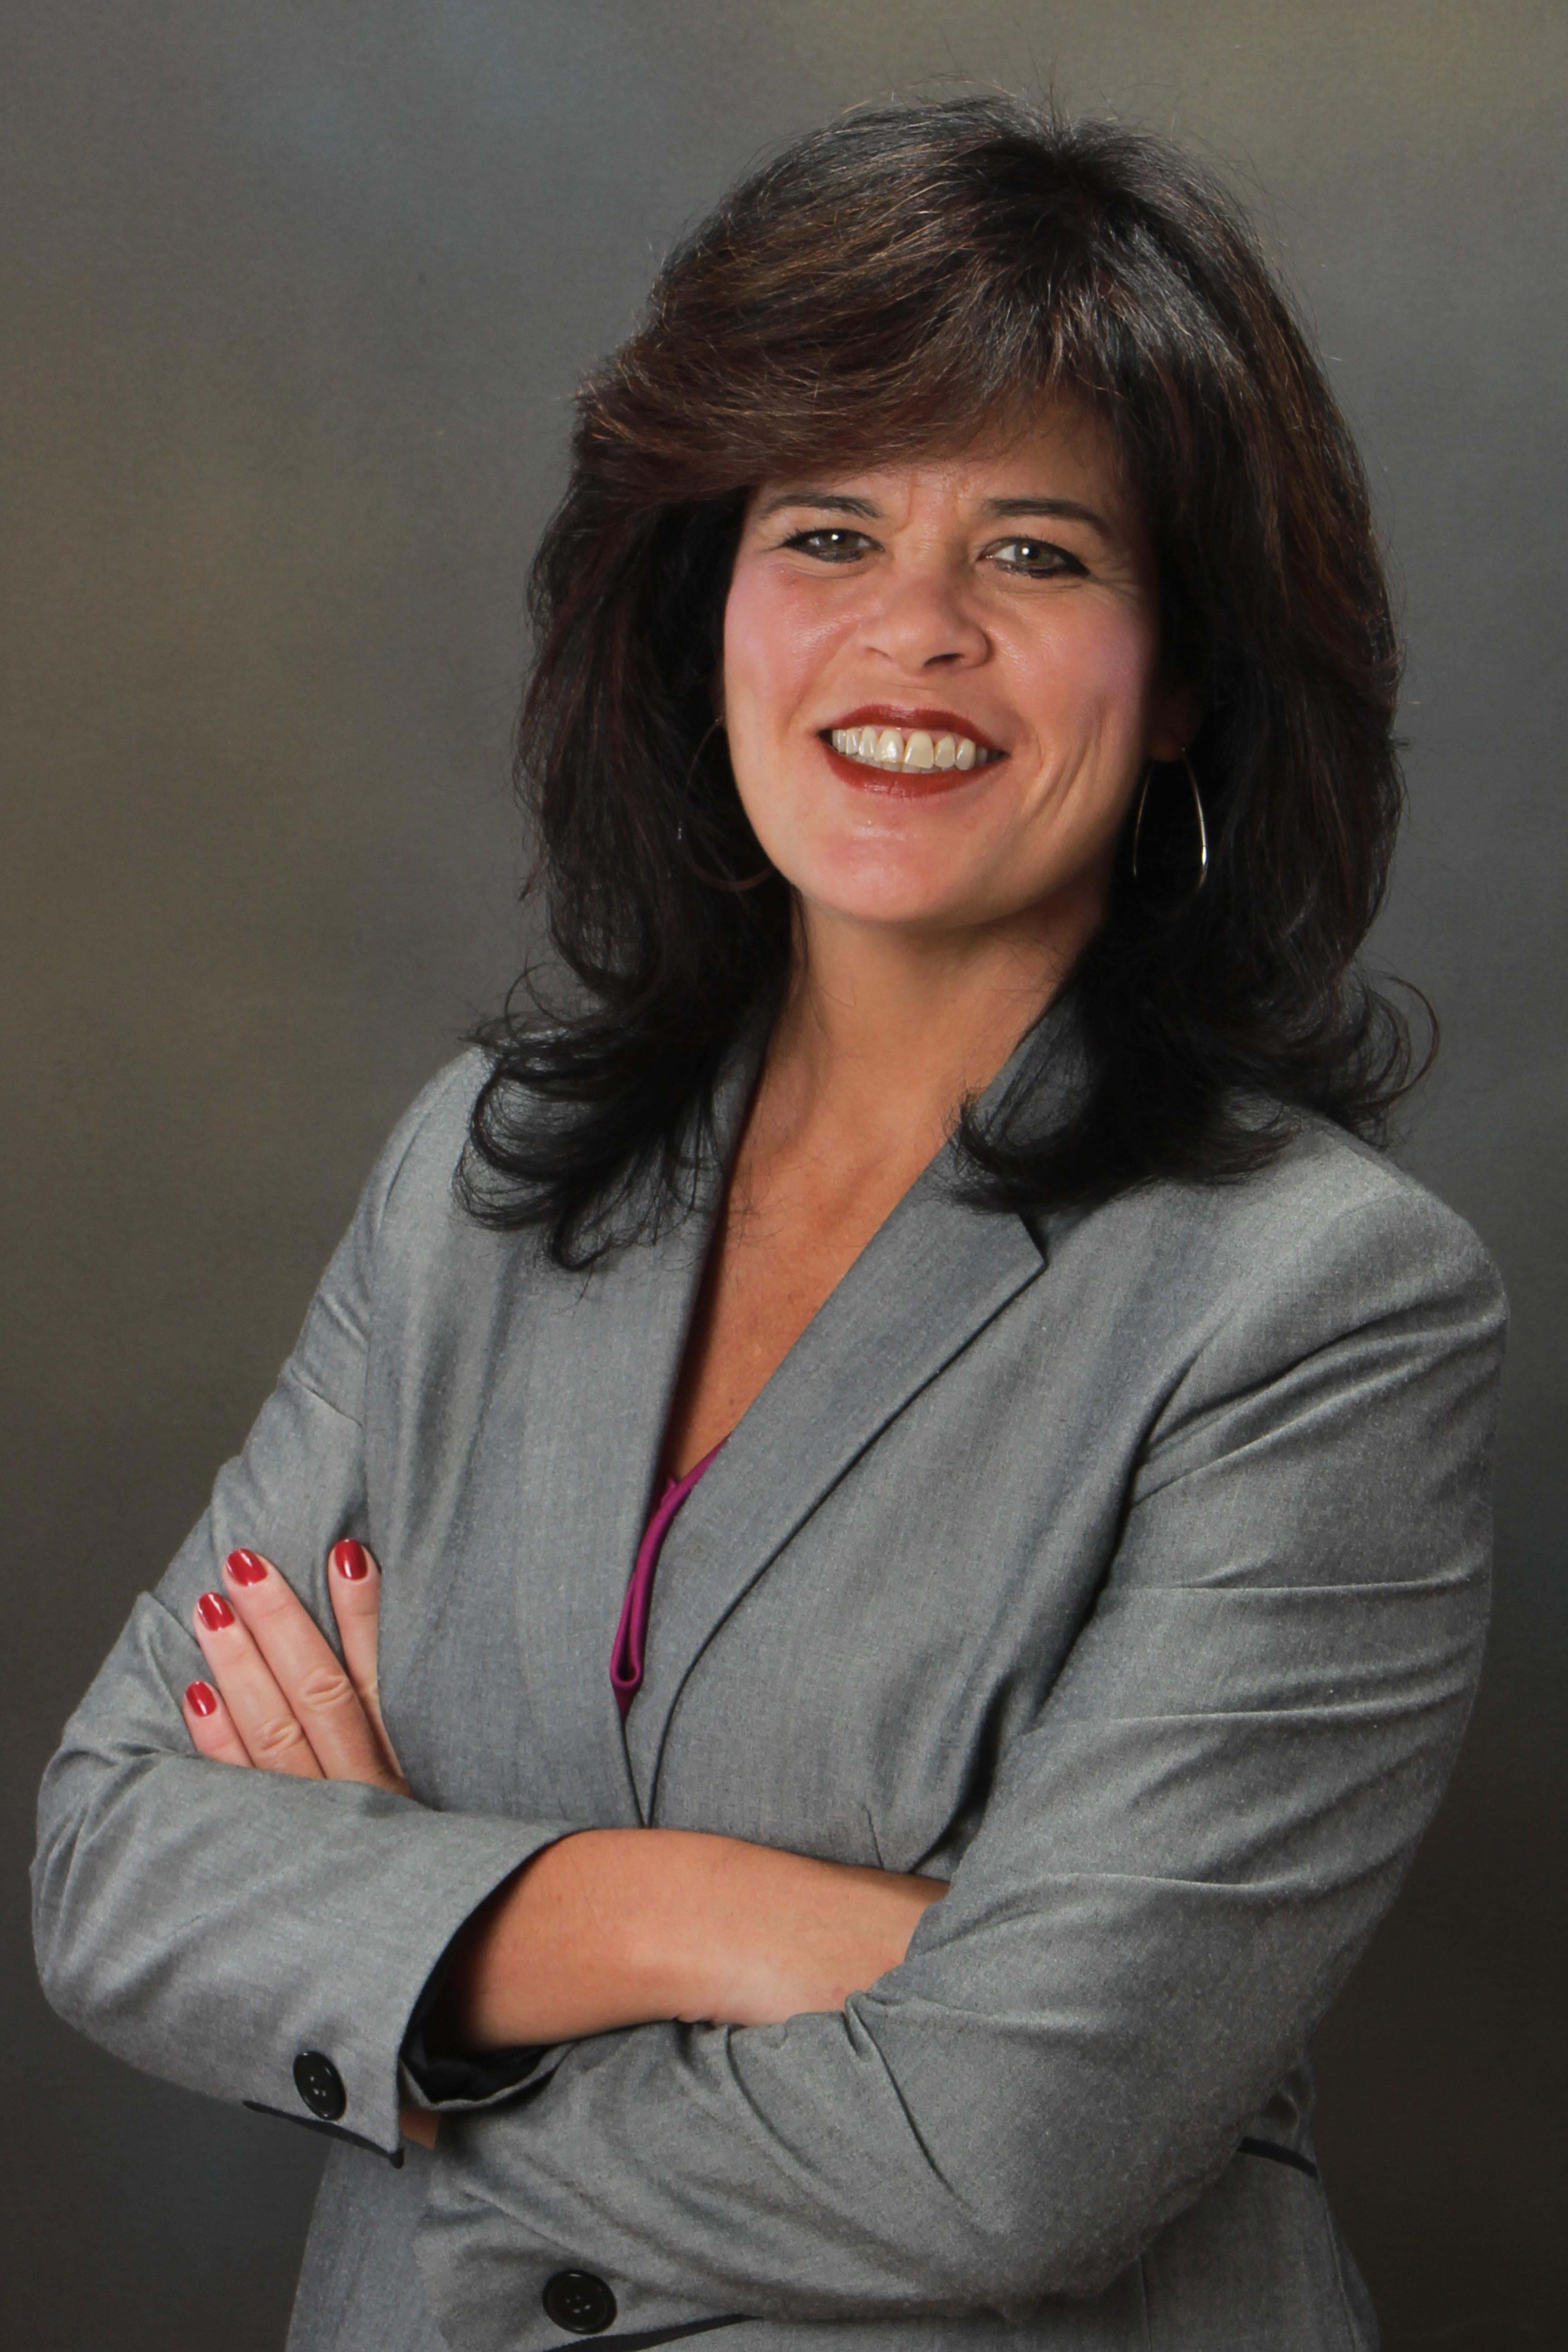 Kelly Sheehan